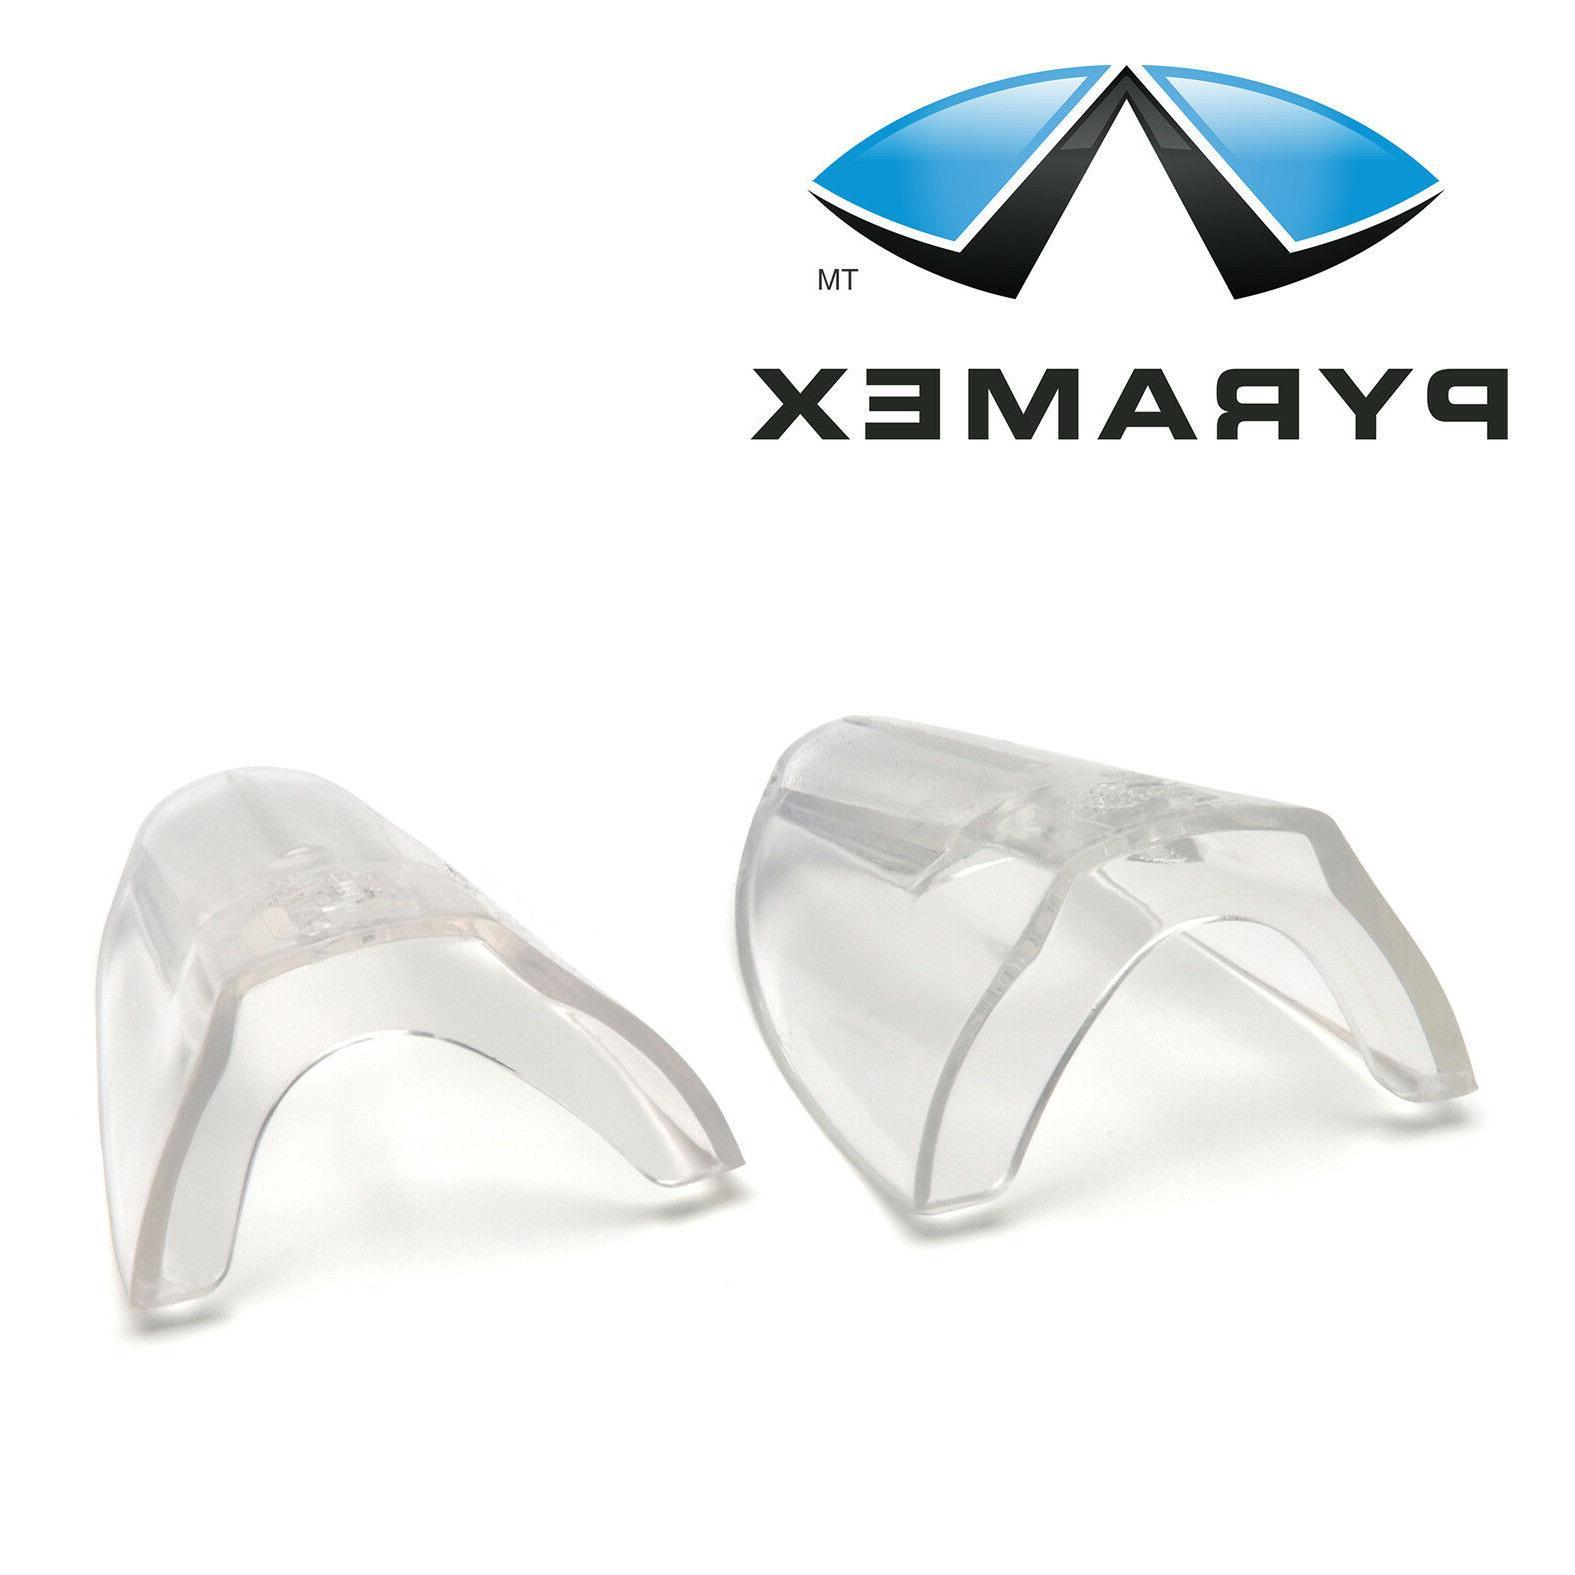 Pyramex Clear Side Shields Universal Fit Flexible For Eye Gl